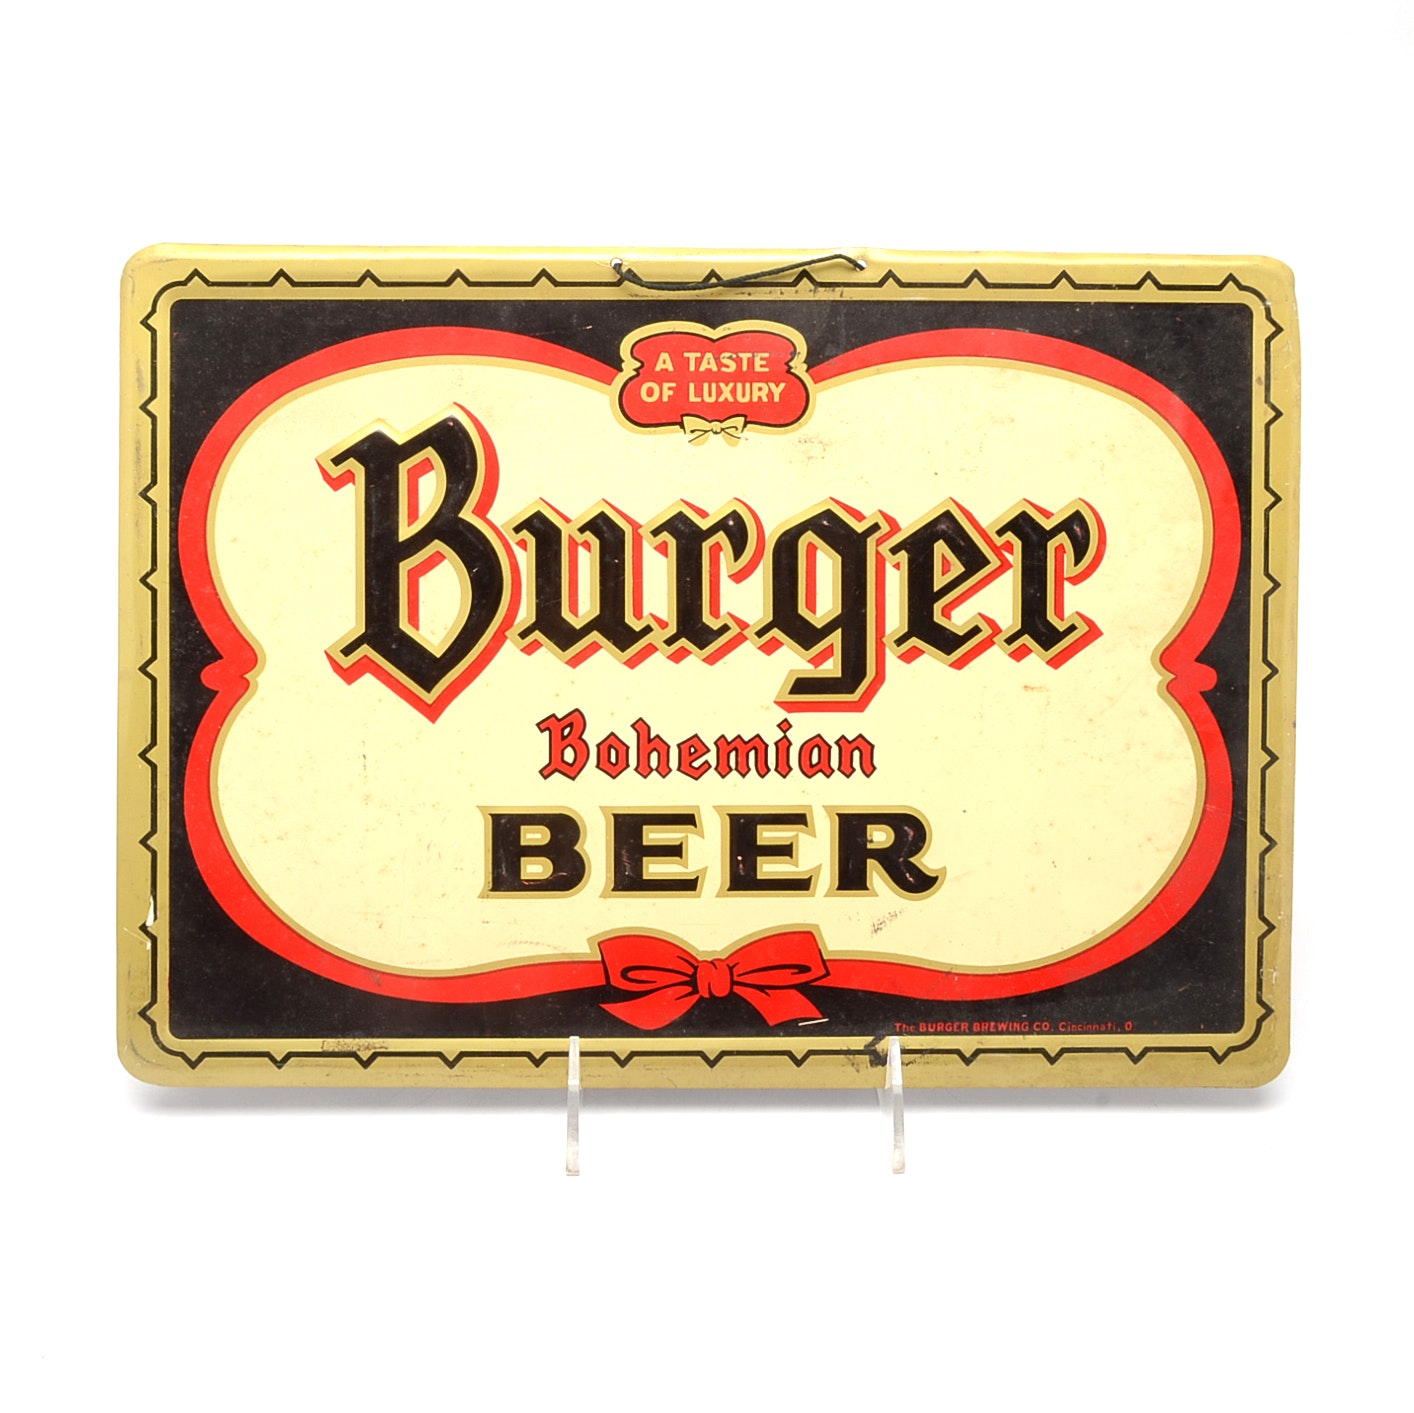 1940s Burger Beer Metal Sign